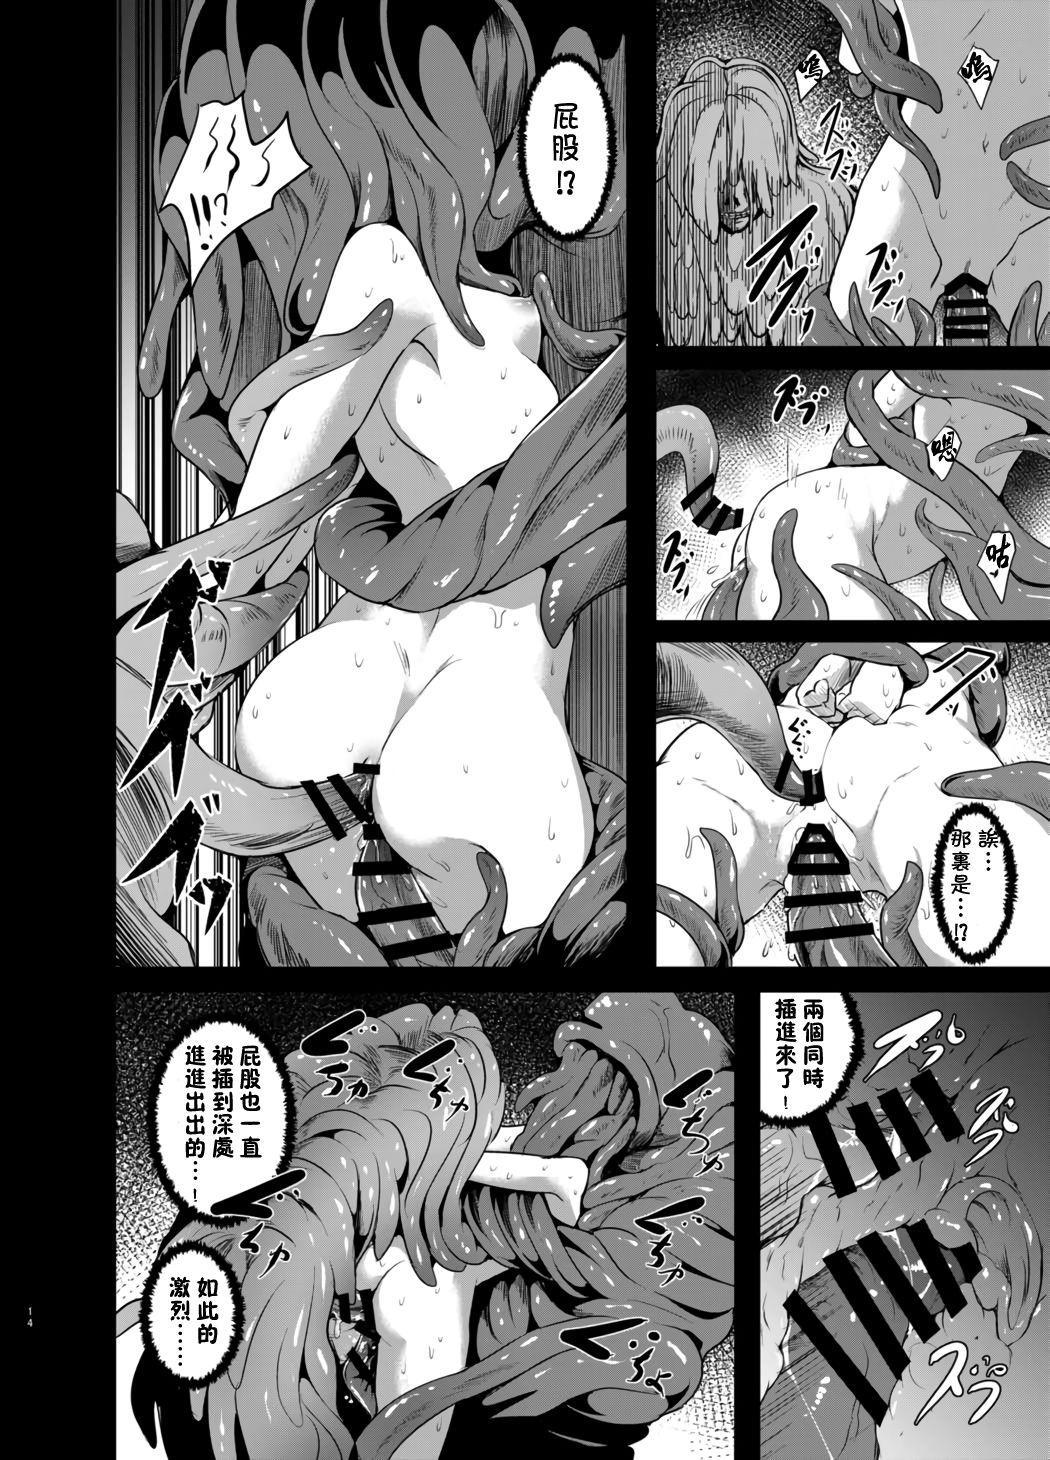 Gensou Kijuu Kuukan Go 12